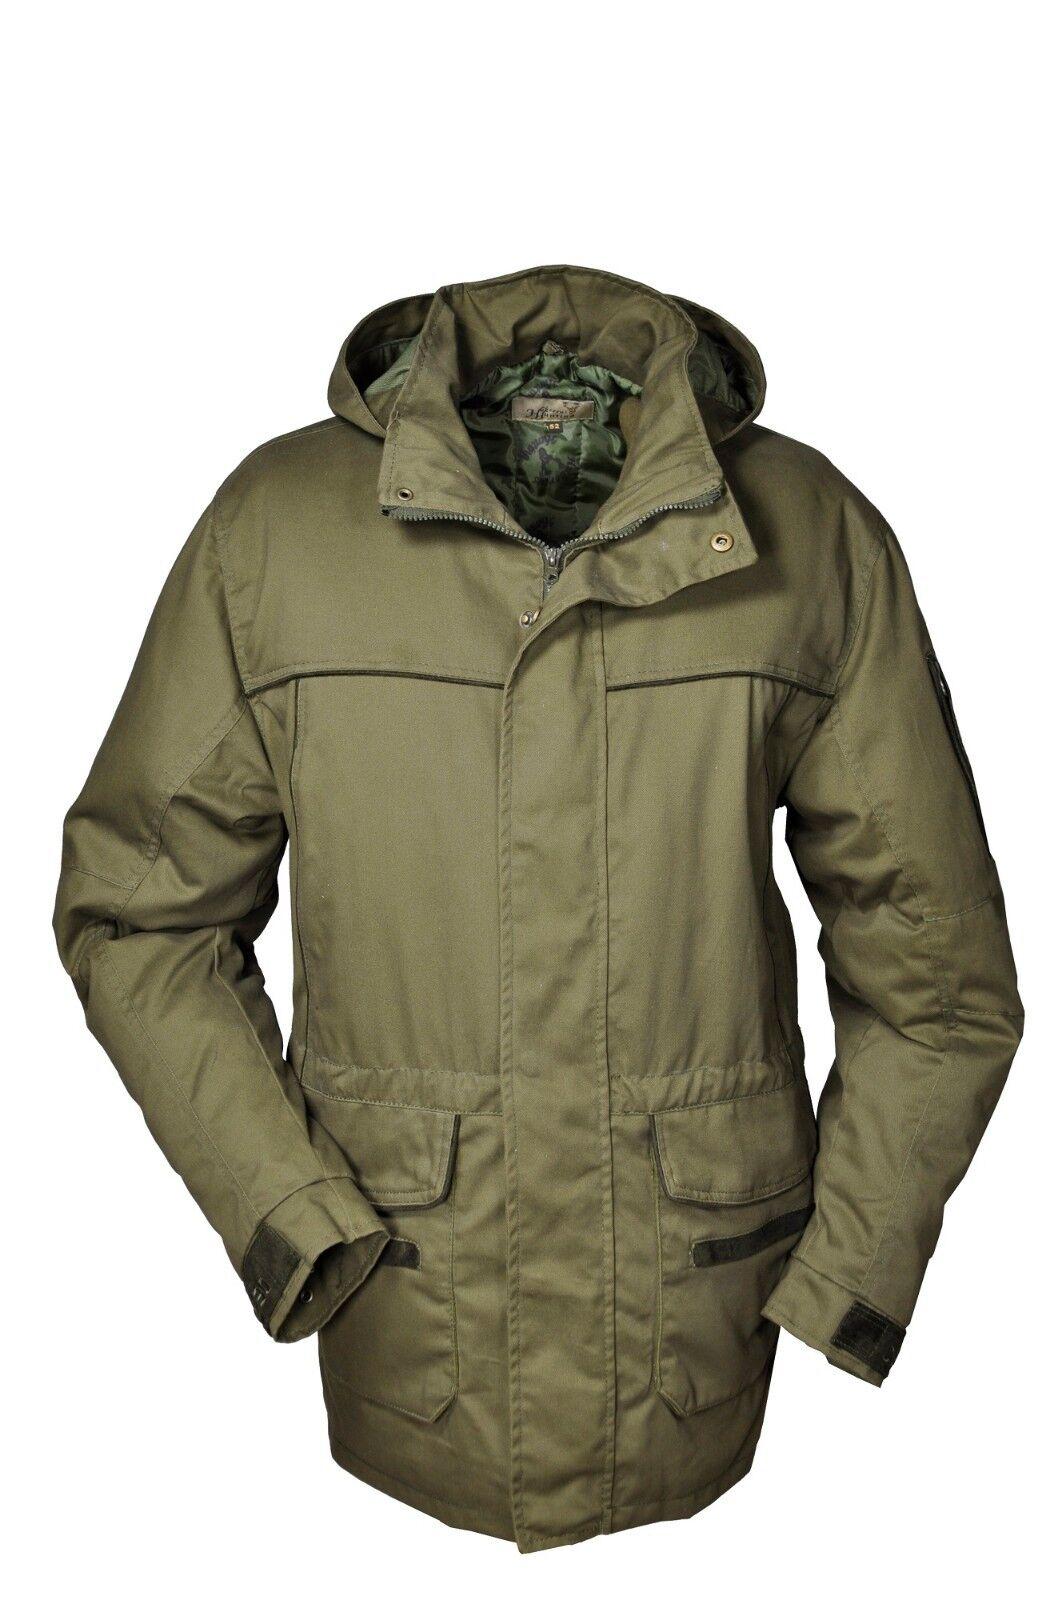 Hubertus caza chaqueta os30tex movimiento caza pirschjagd nuevo